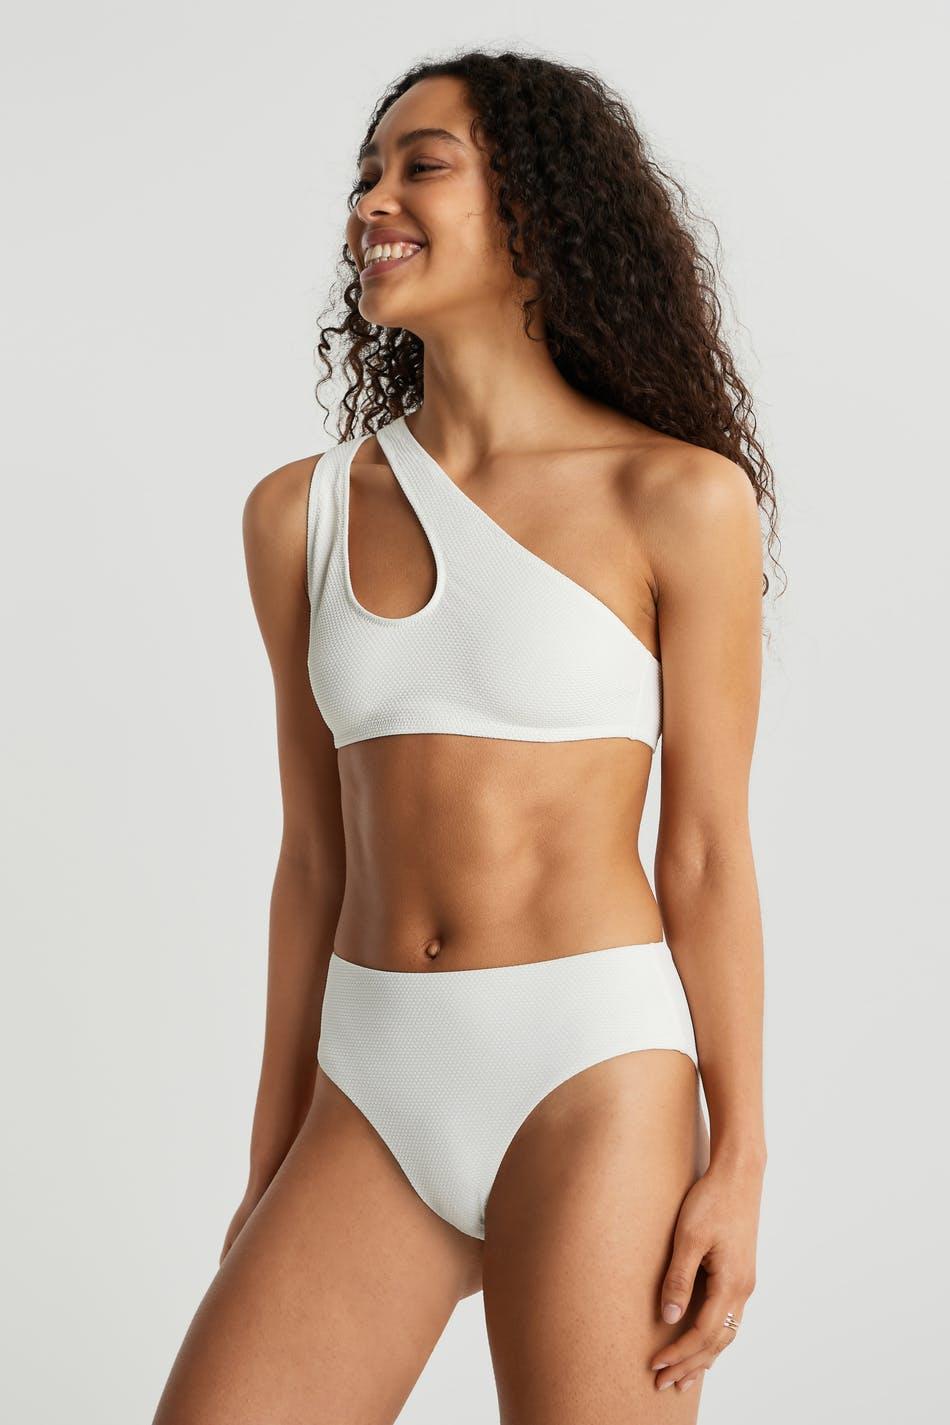 Gina Tricot Nina highwaist bikini brief XL Female Cloud dancer (1062)